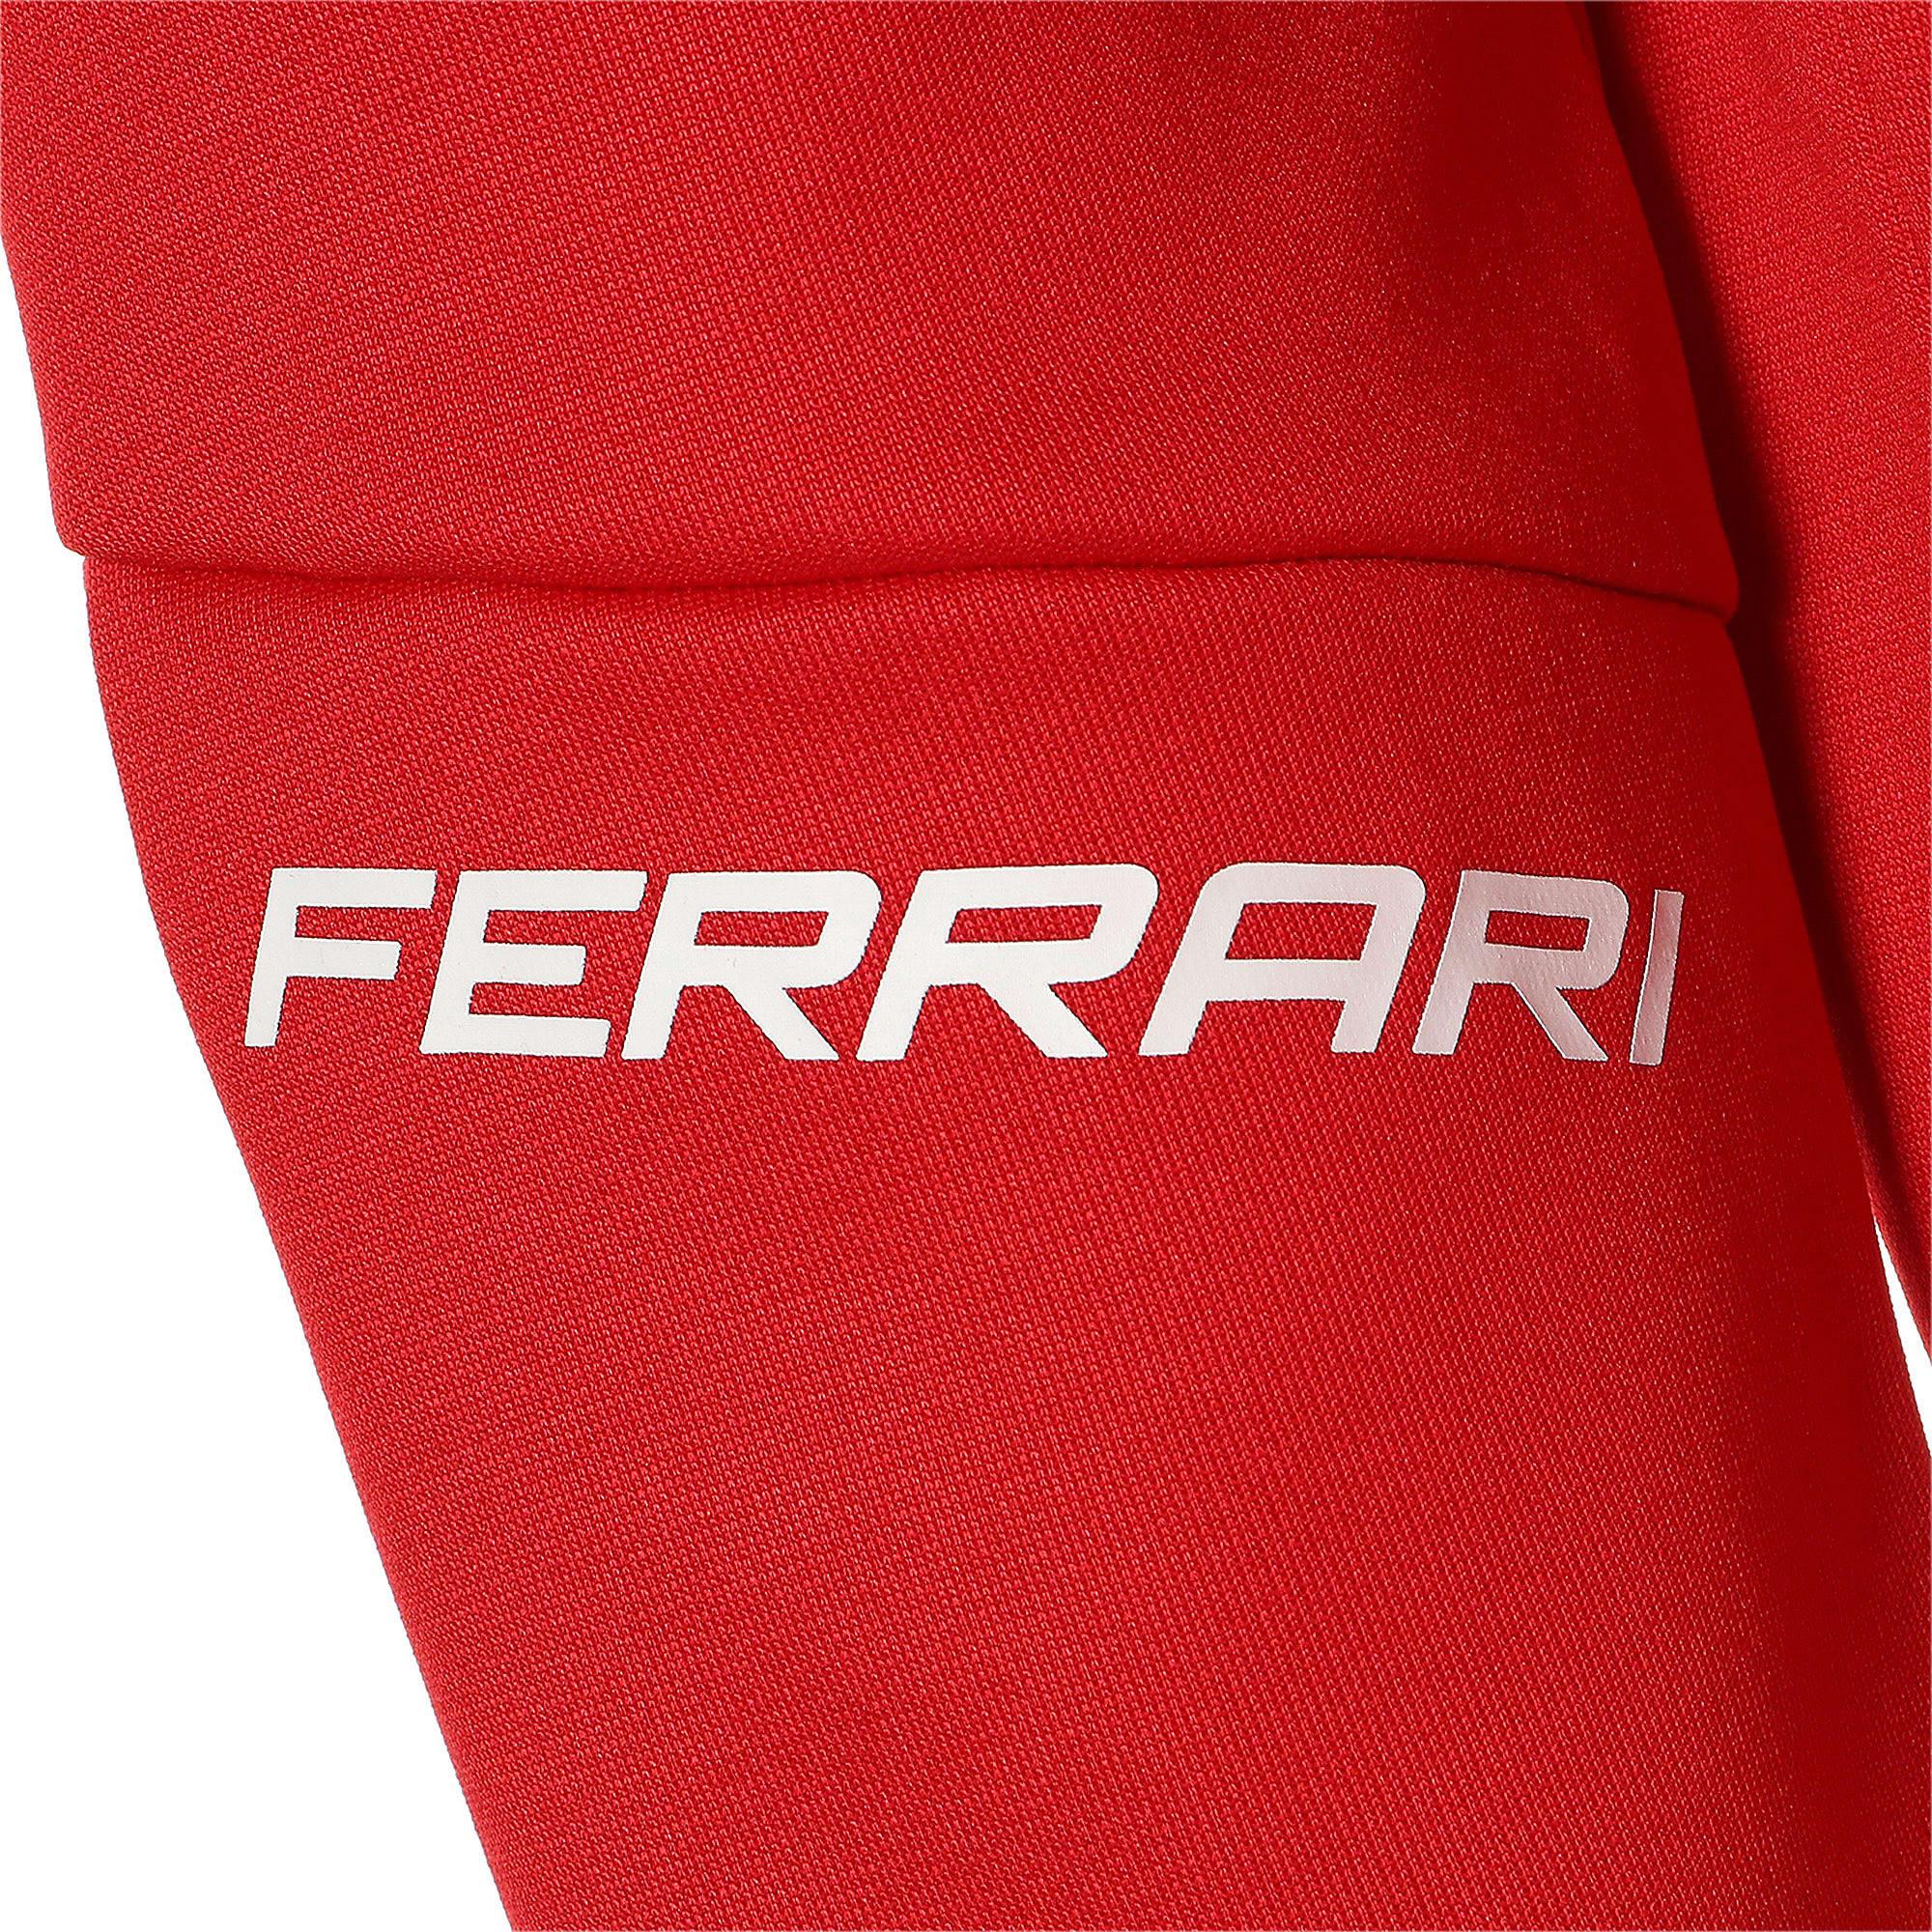 Thumbnail 12 of フェラーリ T7 トラック ジャケット, Rosso Corsa, medium-JPN